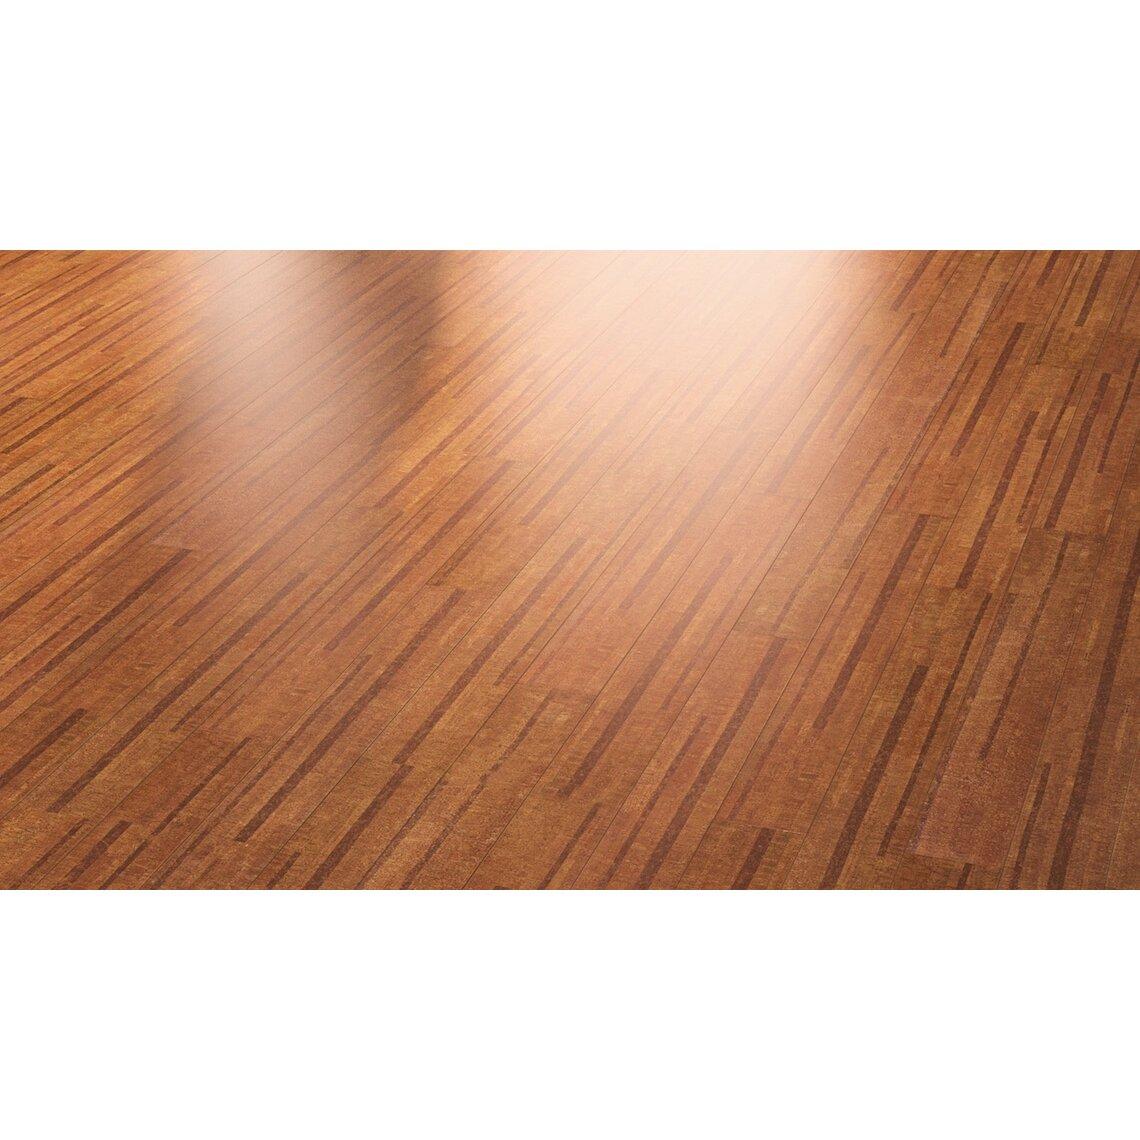 "Cork Flooring High Humidity: Wicanders Corkcomfort 5-1/2"" Engineered Cork Hardwood"